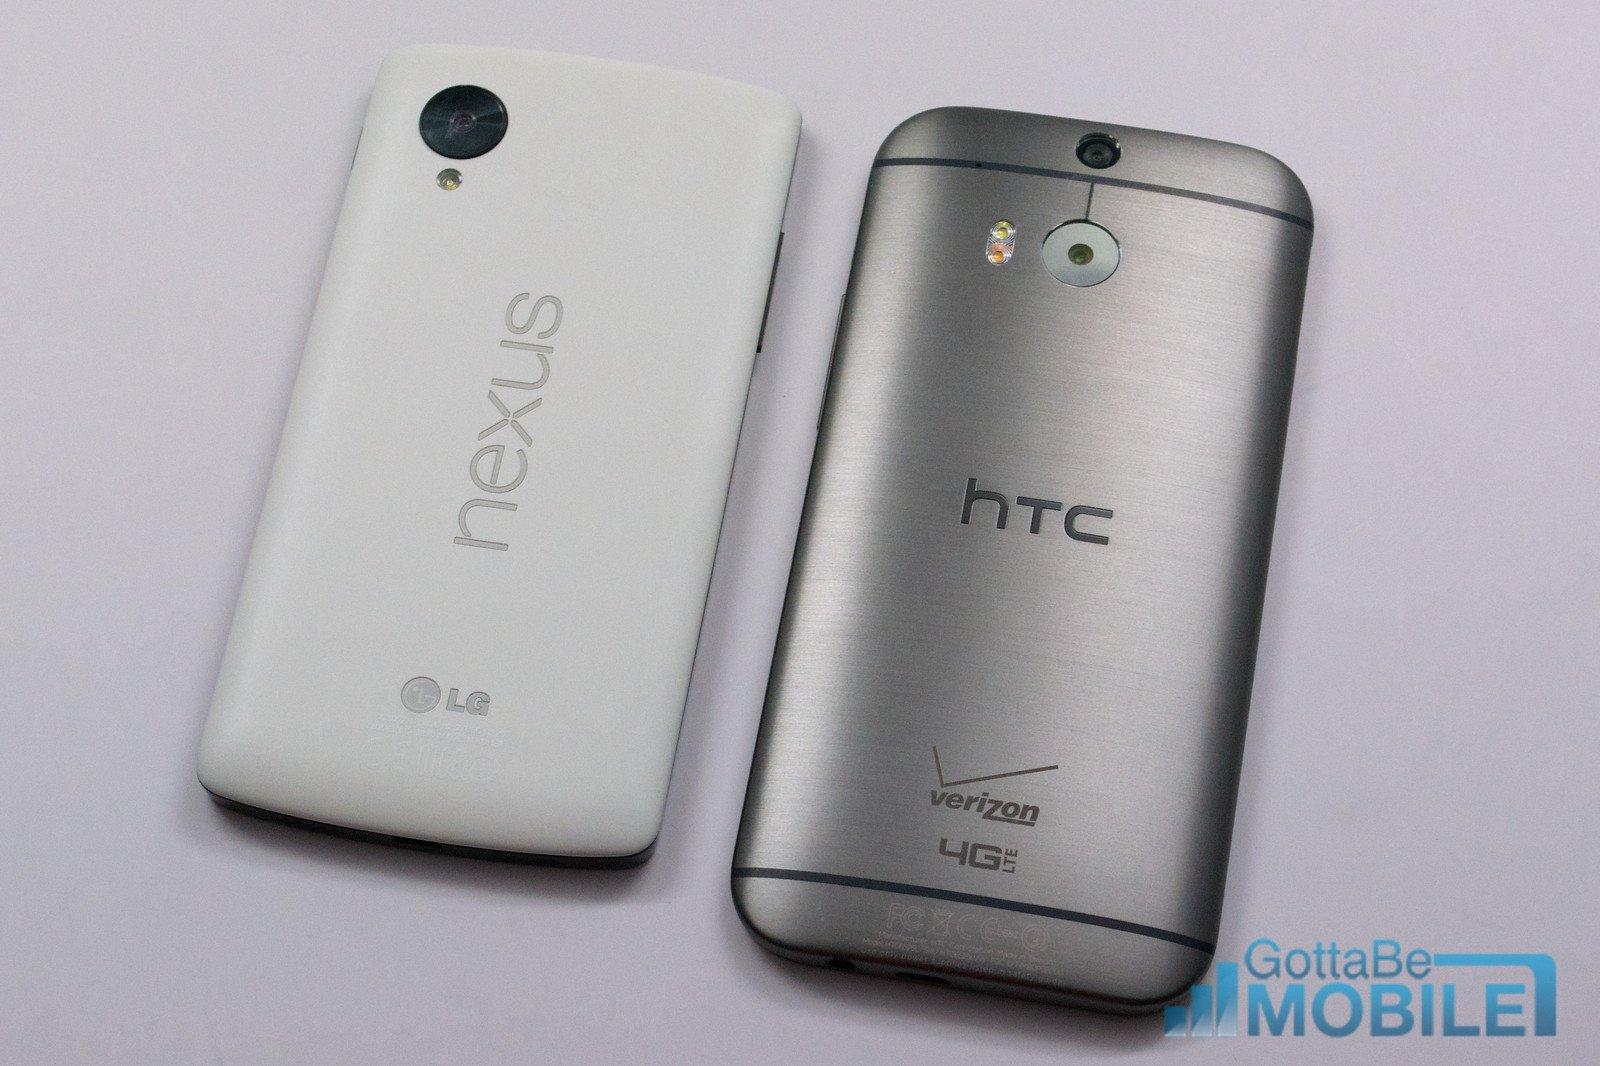 Ny HTC One M8 vs - Nexus 5 -X3